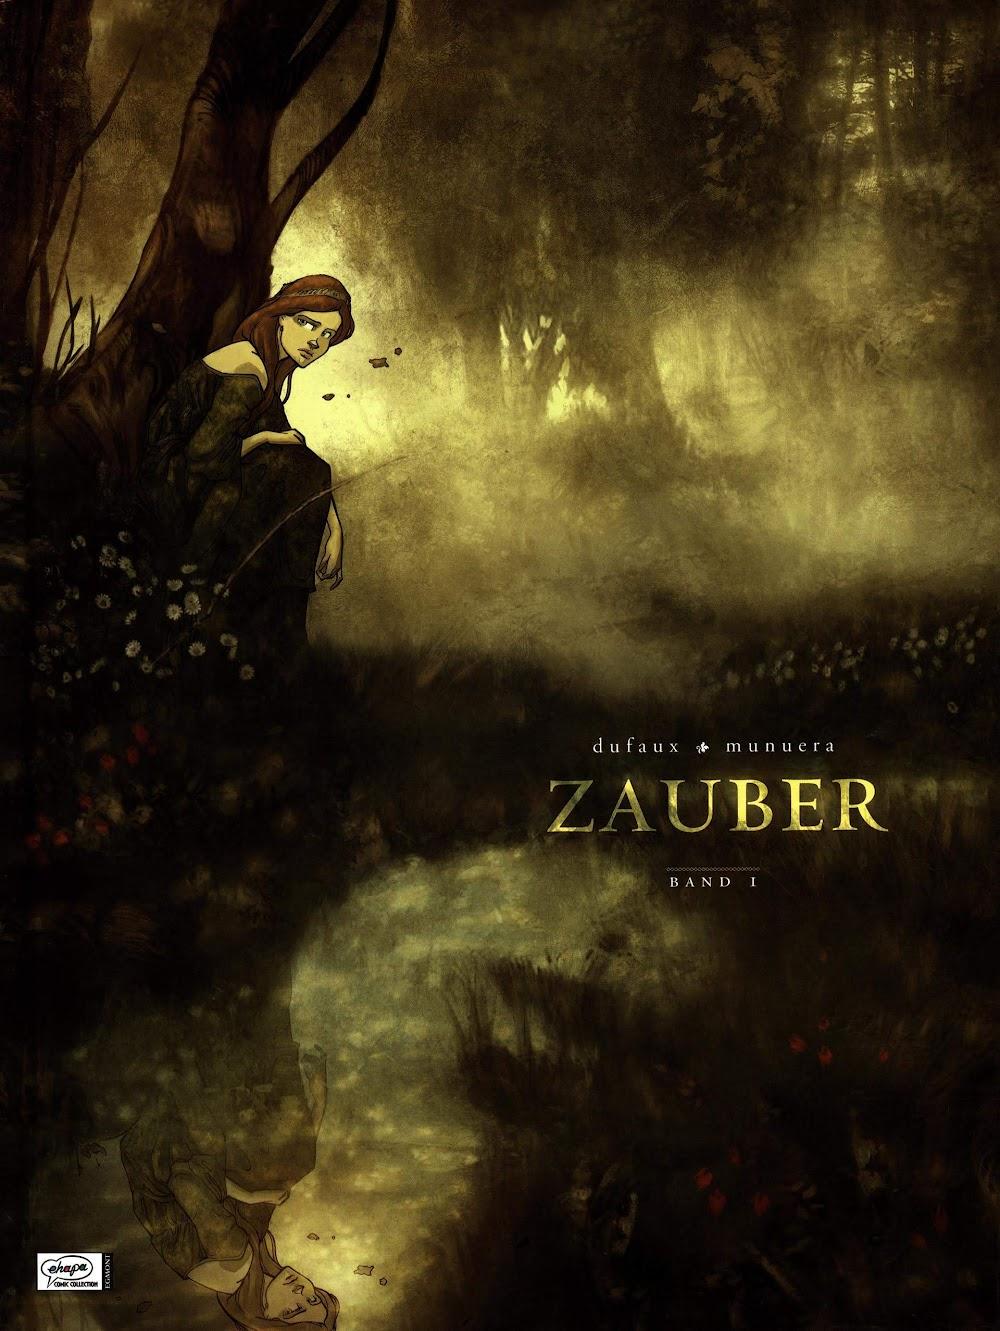 Zauber (2013) - komplett